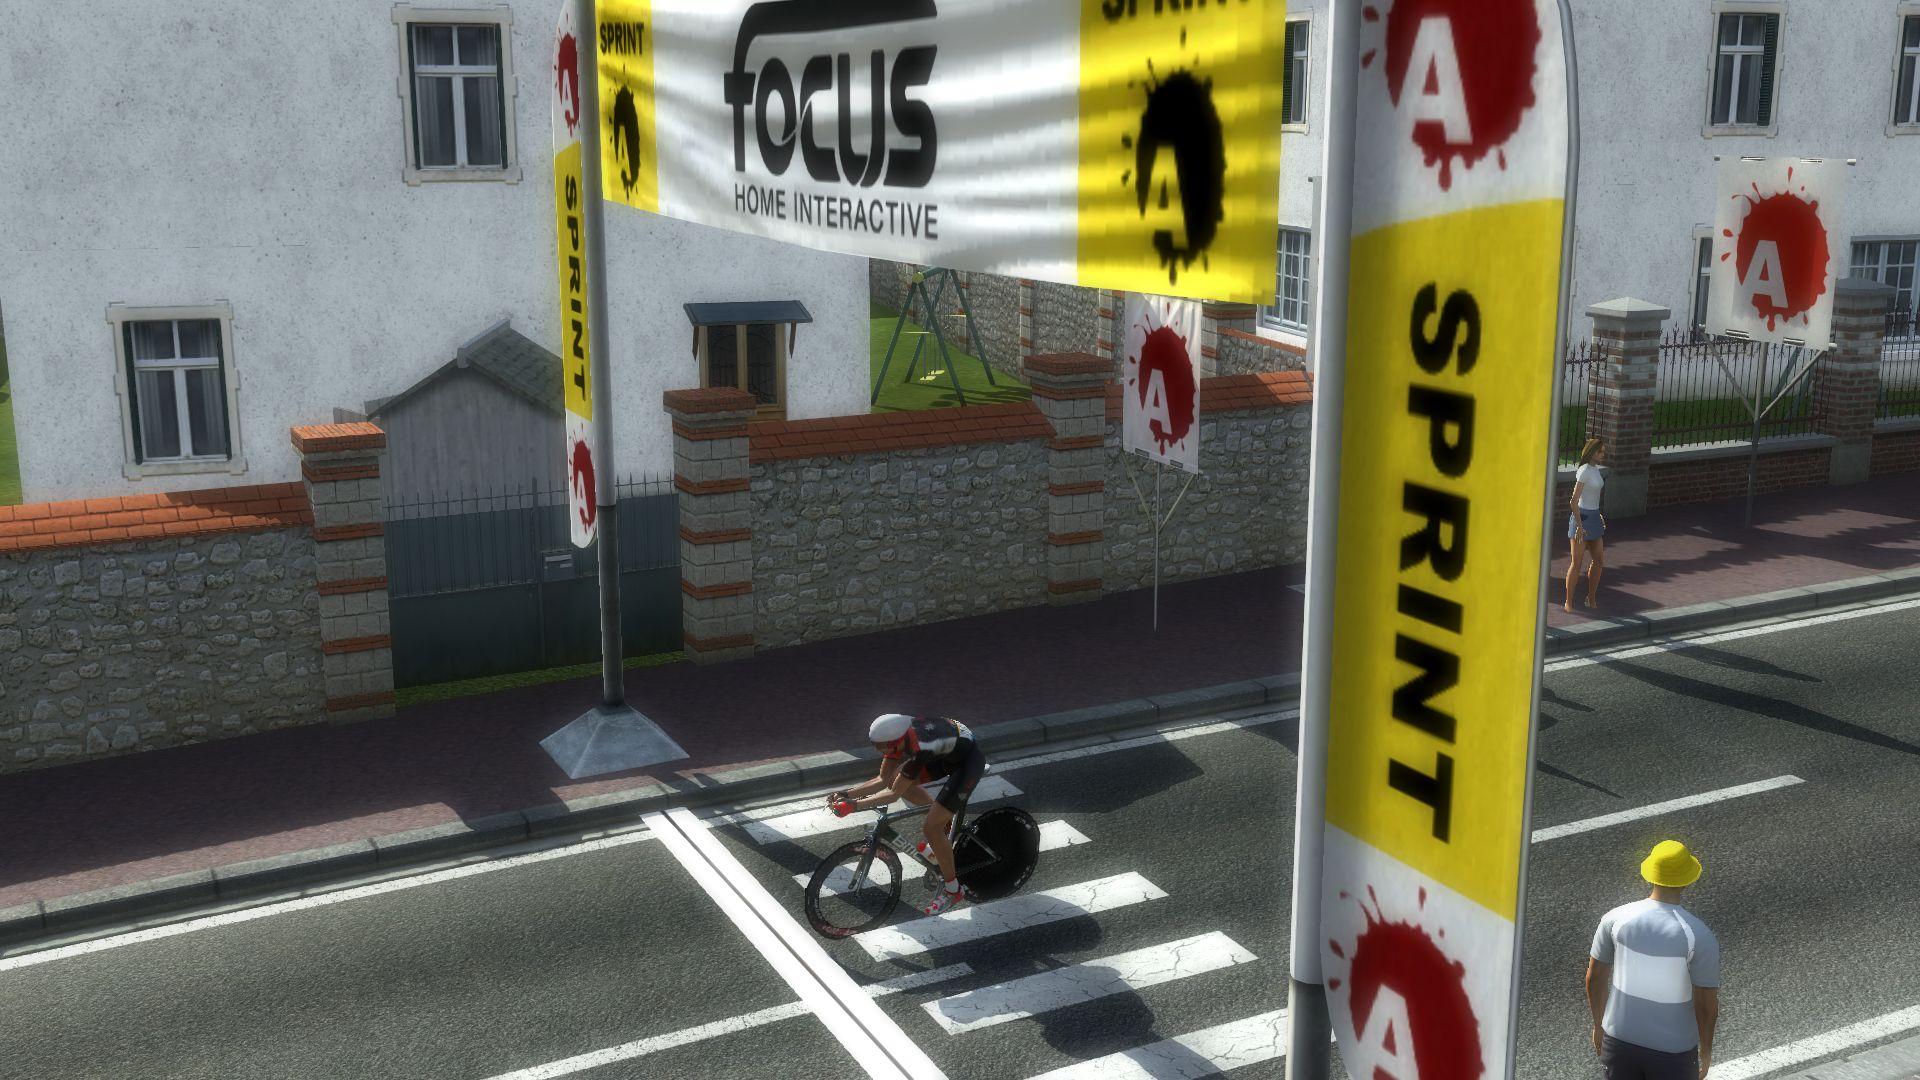 pcmdaily.com/images/mg/2019/Races/C1/Bayern/S4/mg19_bay_s04_28.jpg